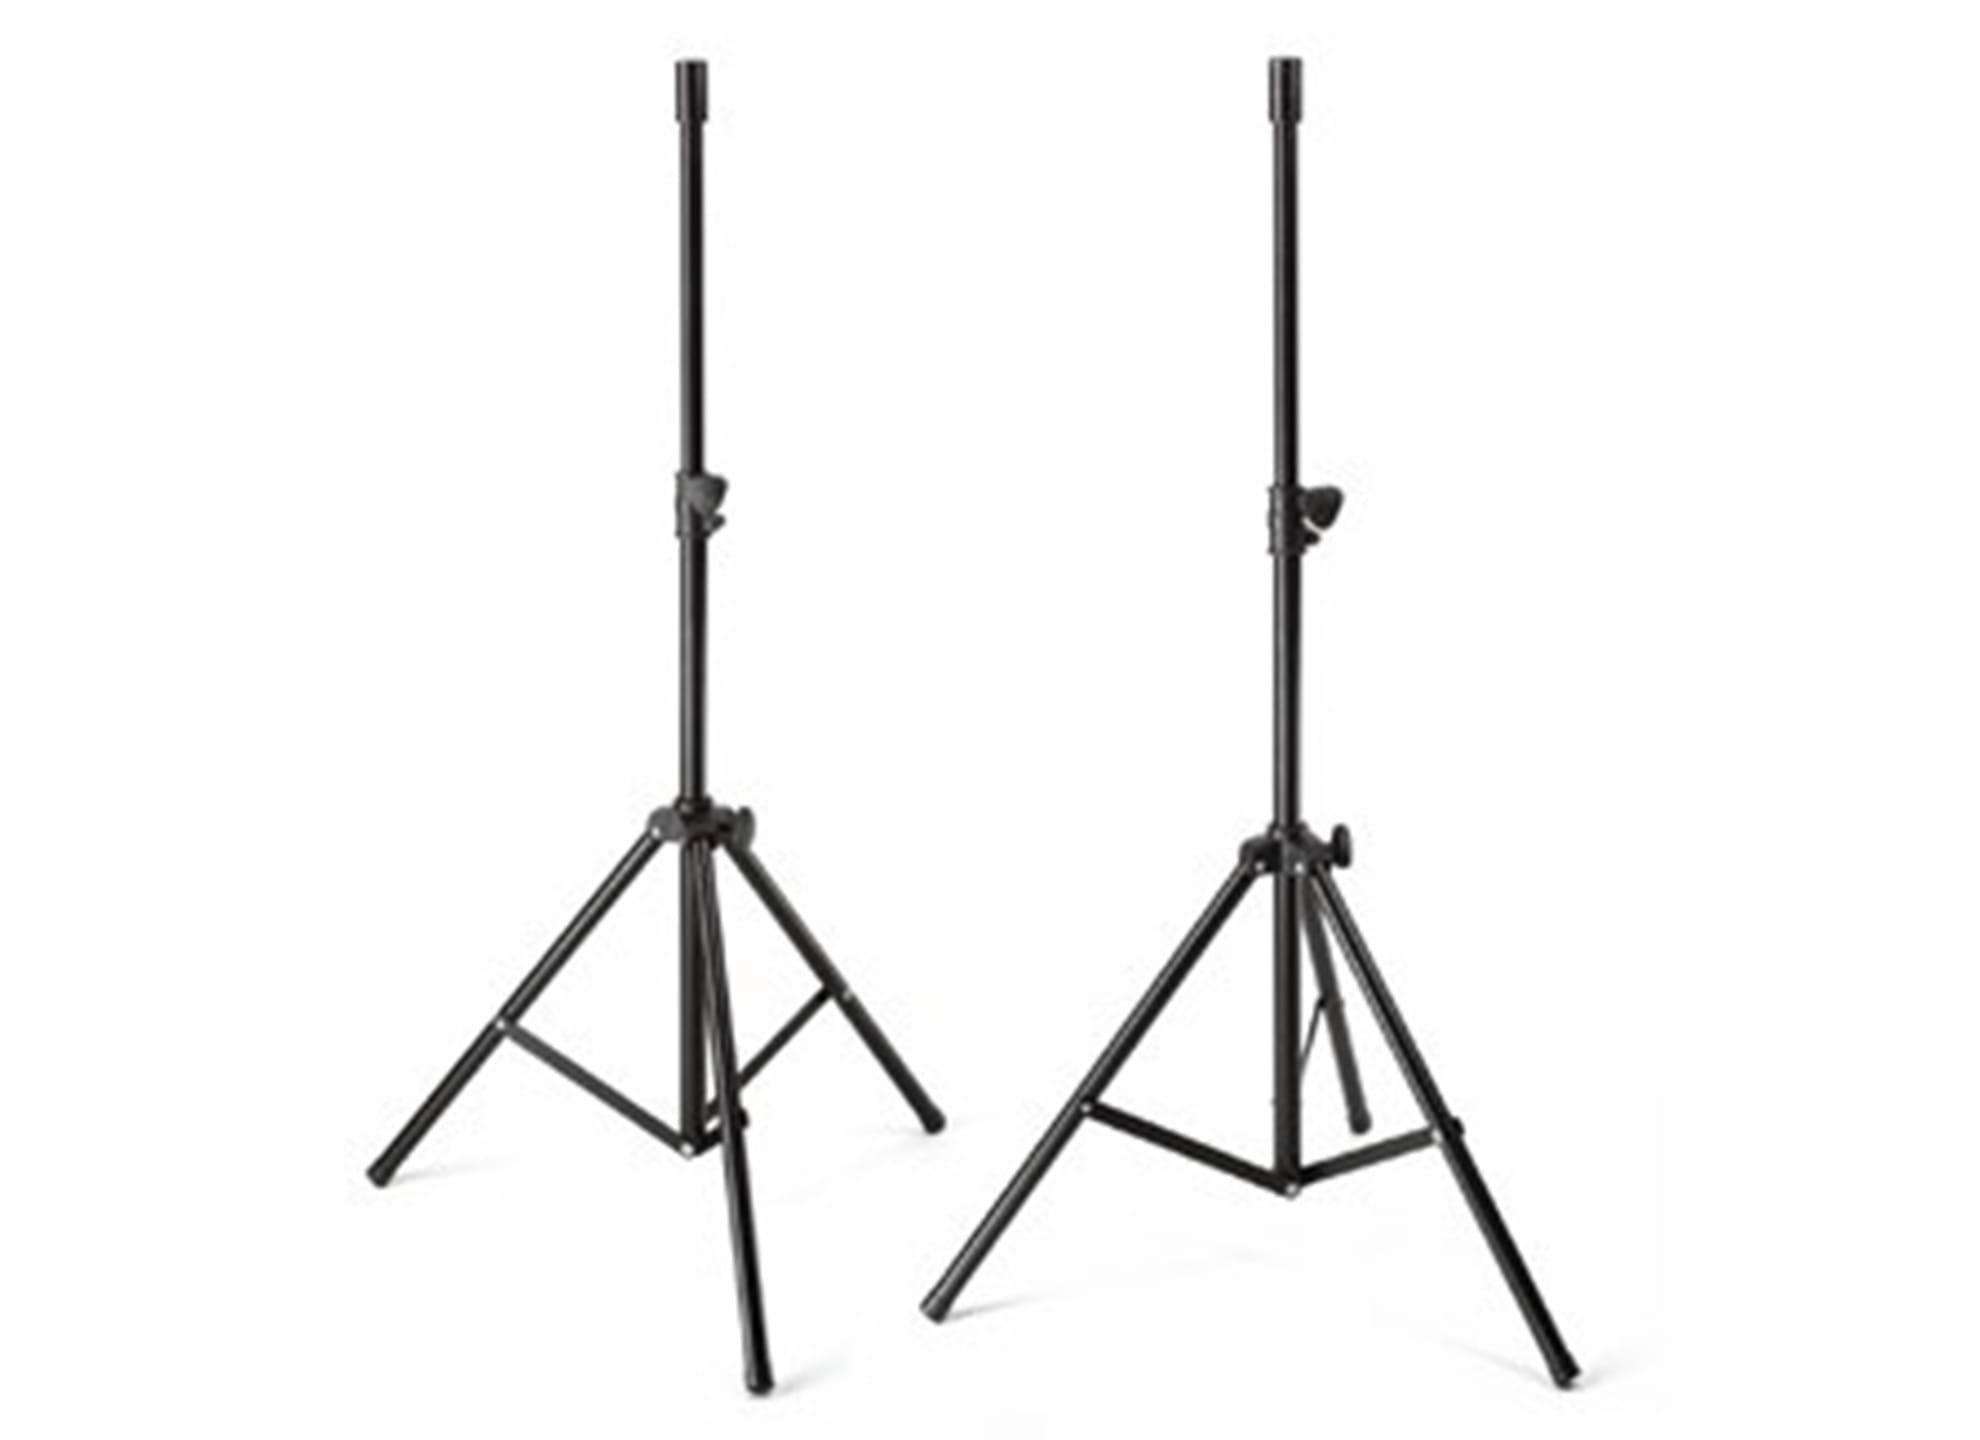 SPS 5000 Speaker Stand 2-pack